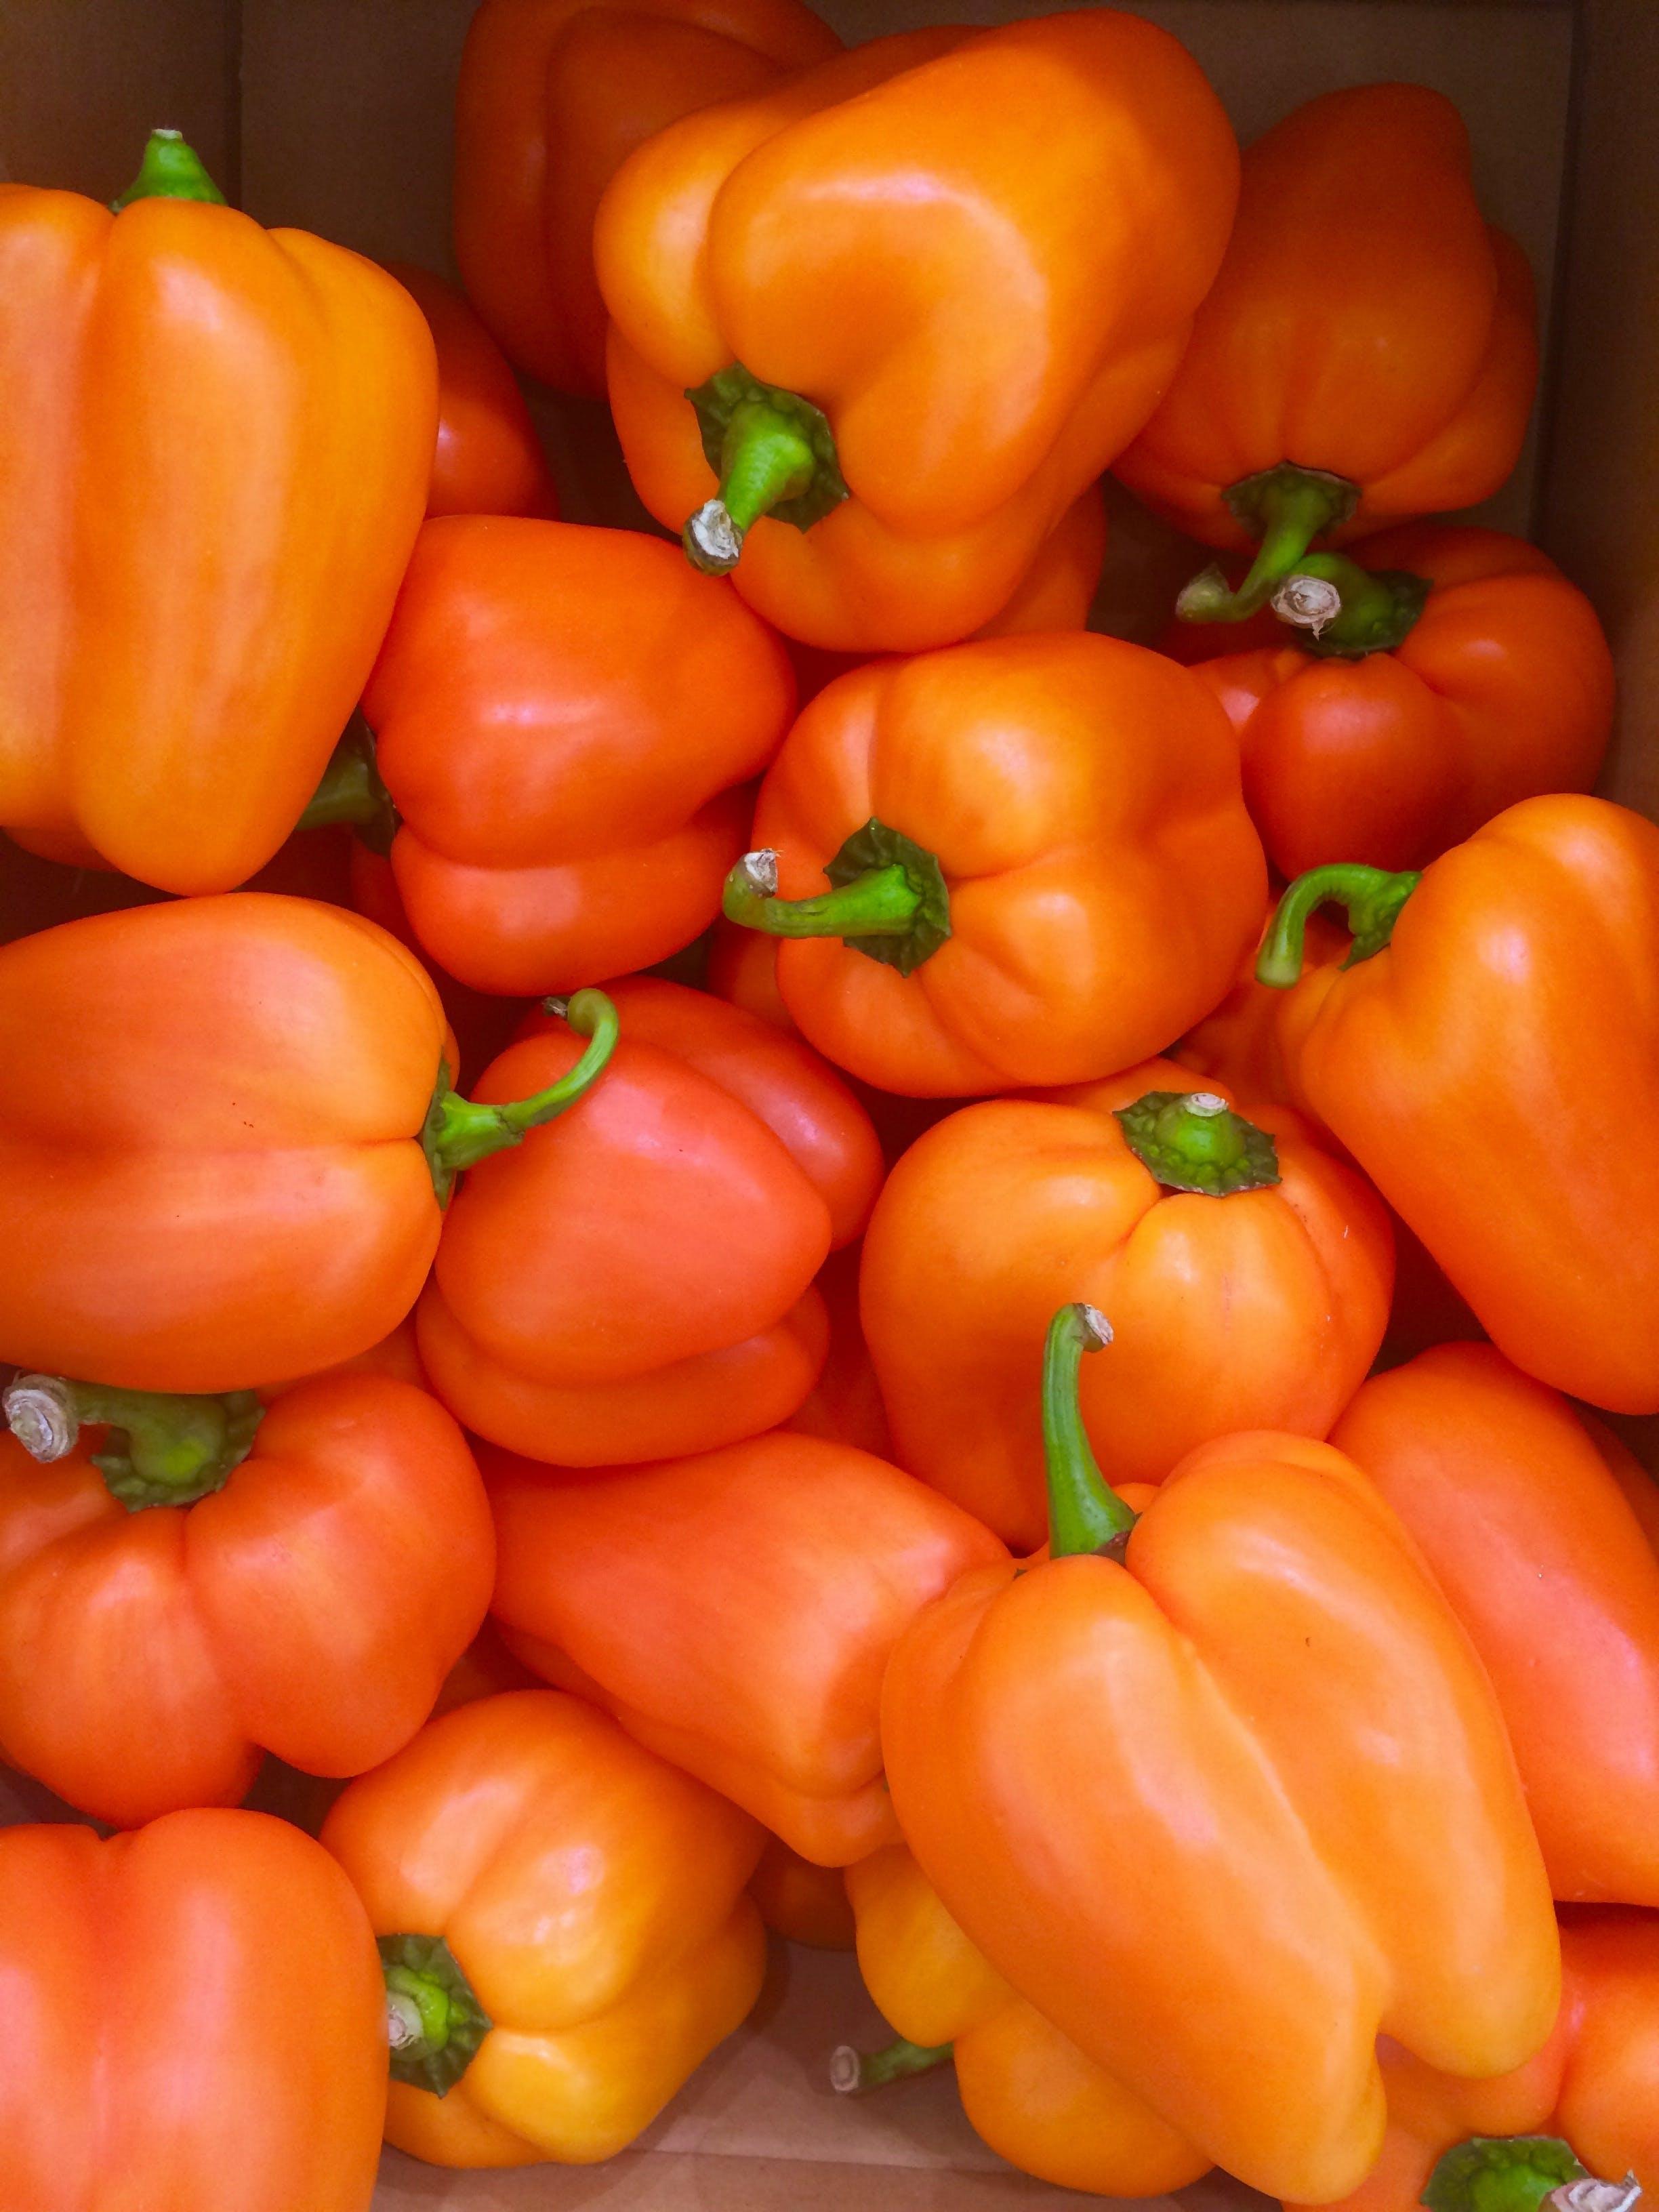 Free stock photo of vegetables, orange, green, supermarket